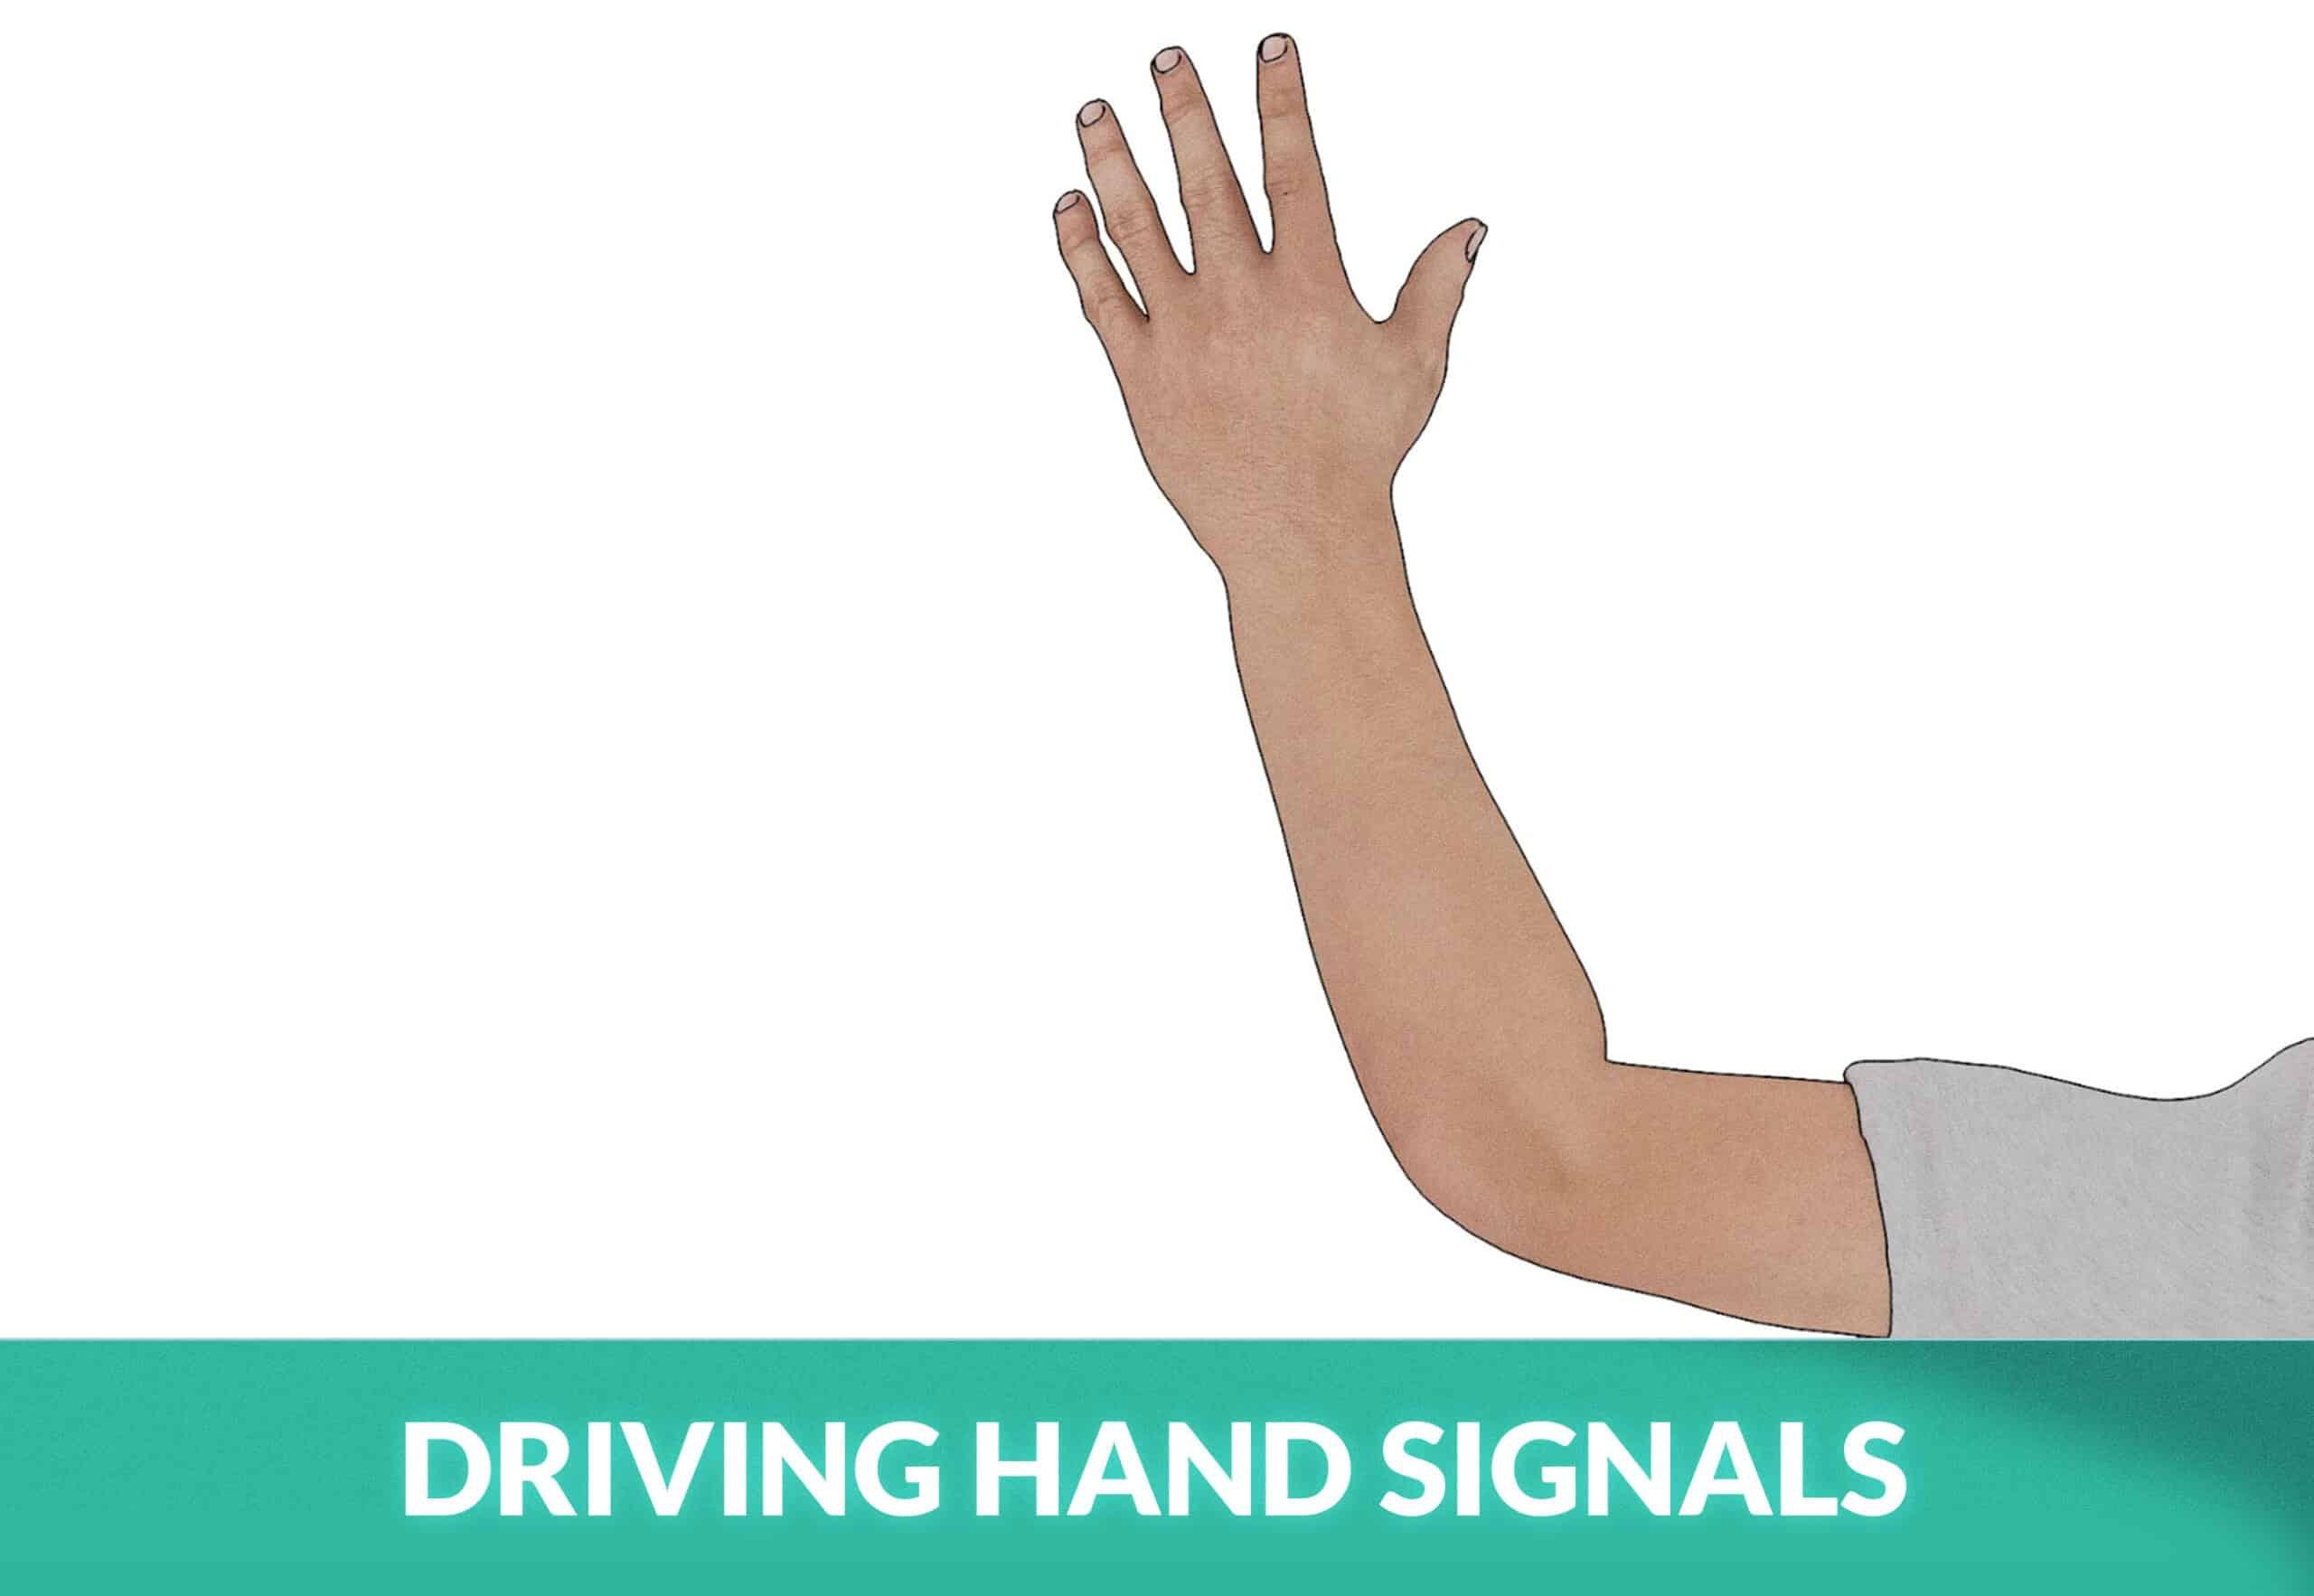 DRIVING HAND SIGNALS